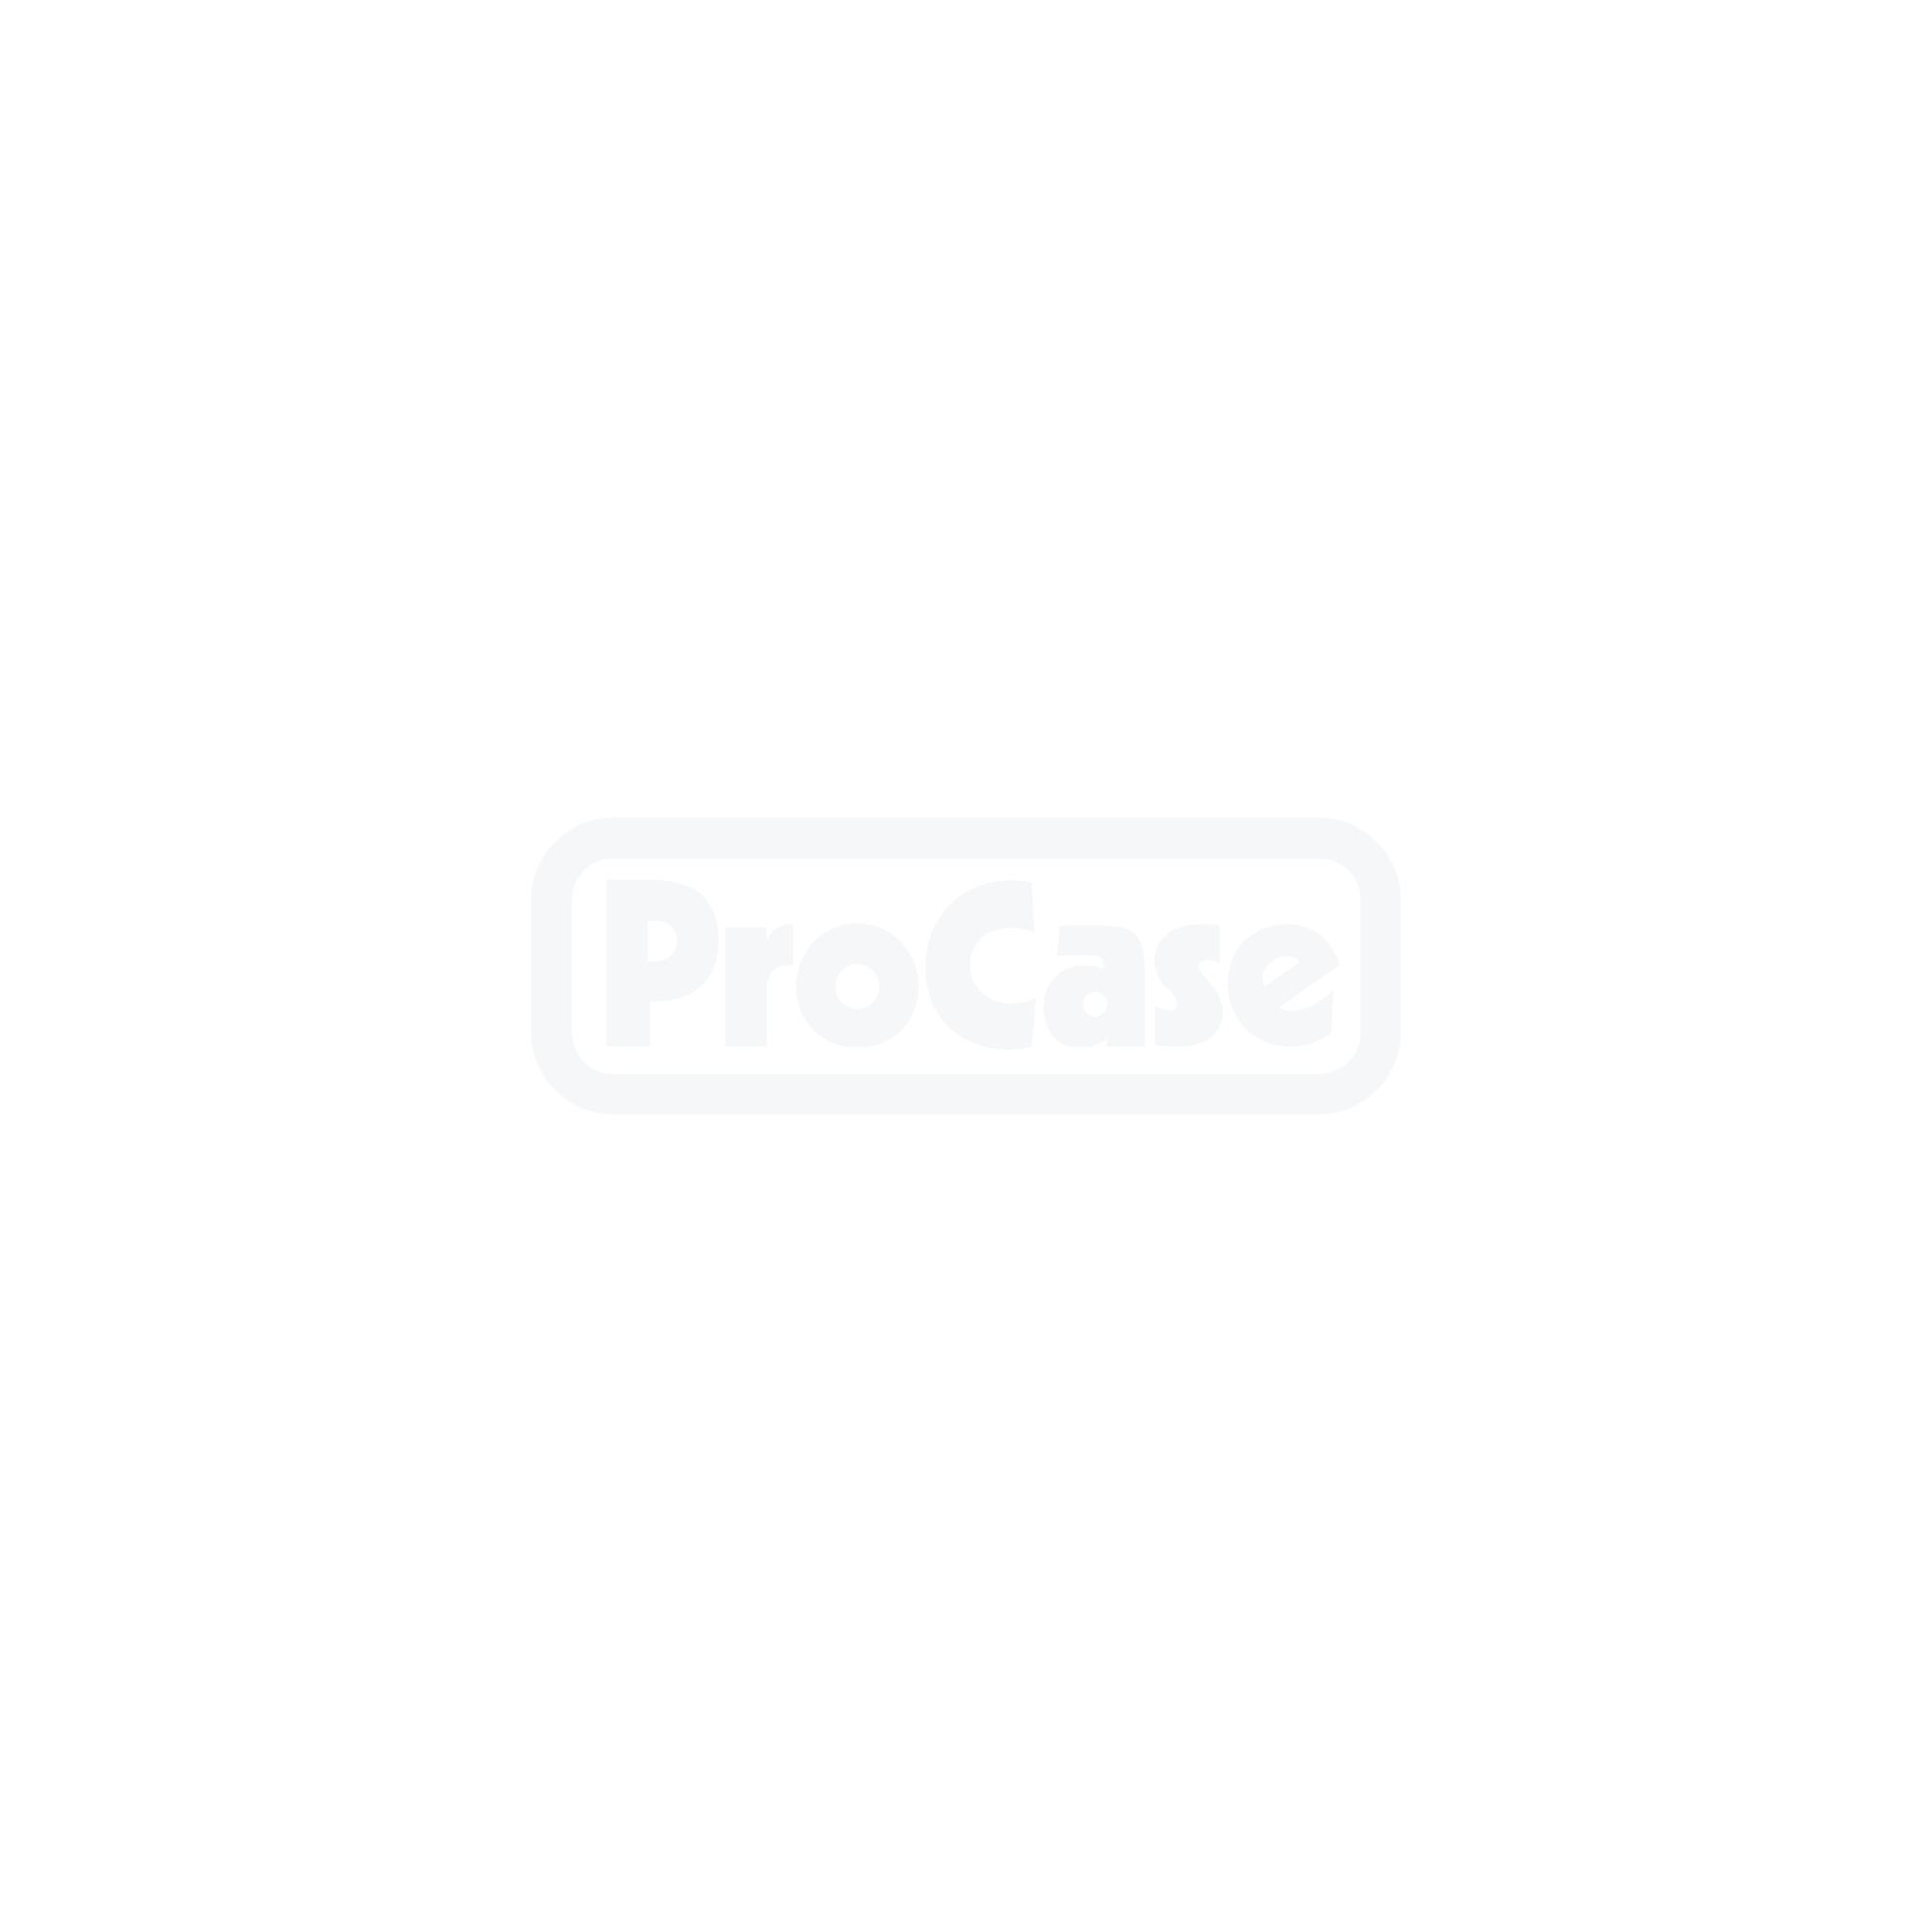 Flightcase für 2 d&b T Flugrahmen 3